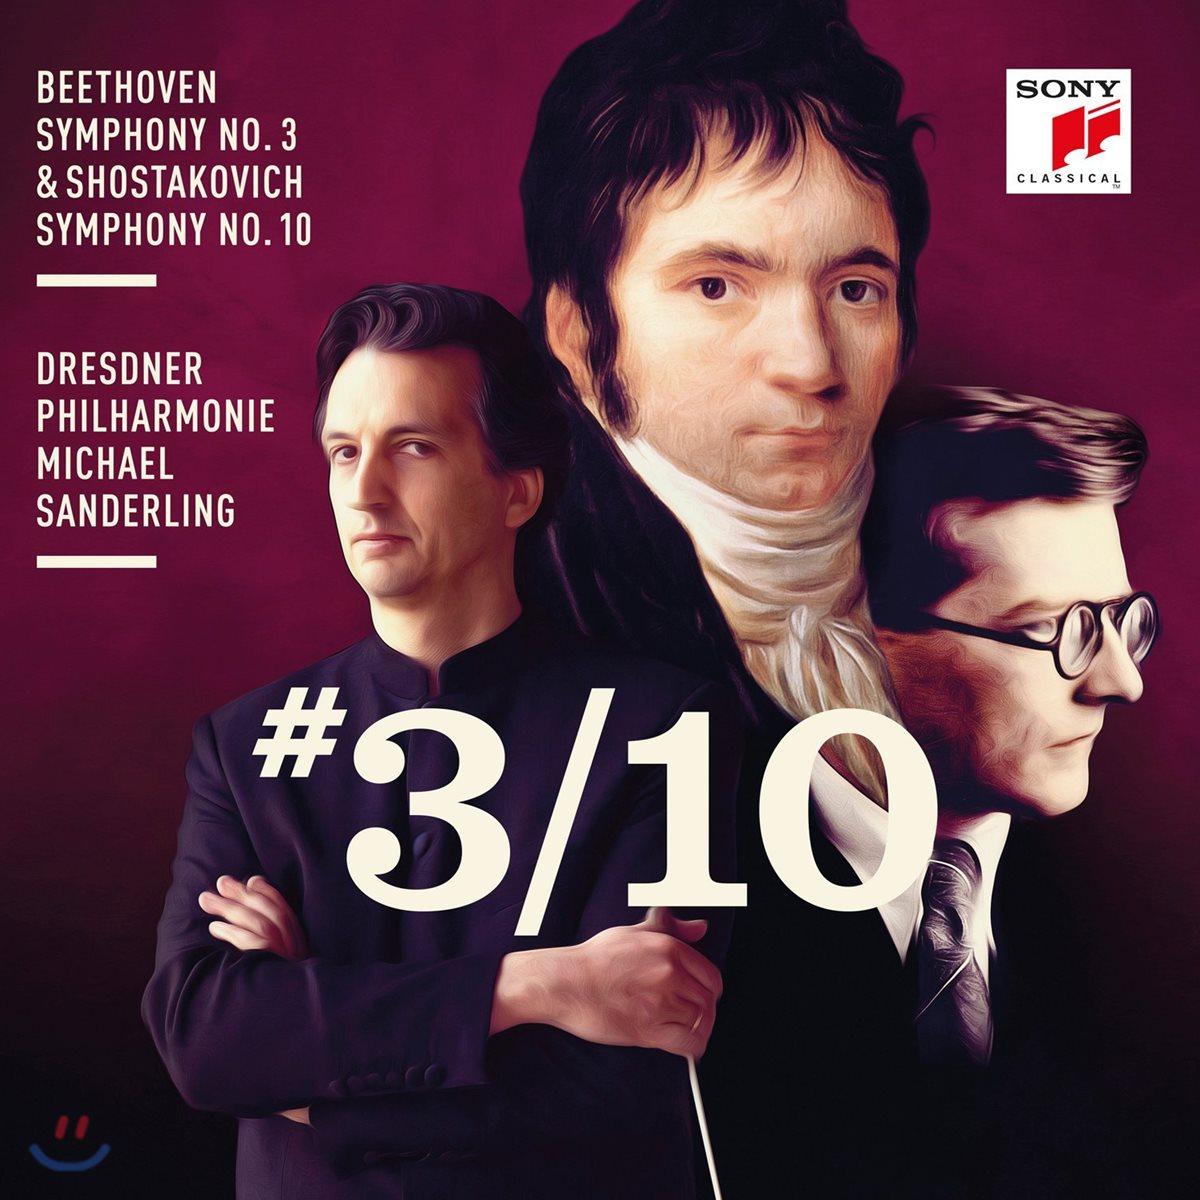 Michael Sanderling #3/10 - 베토벤: 교향곡 3번 / 쇼스타코비치: 교향곡 10번 - 미하엘 잔데를링, 드레스덴 필하모닉 (Beethoven / Shostakovich: Symphonies)